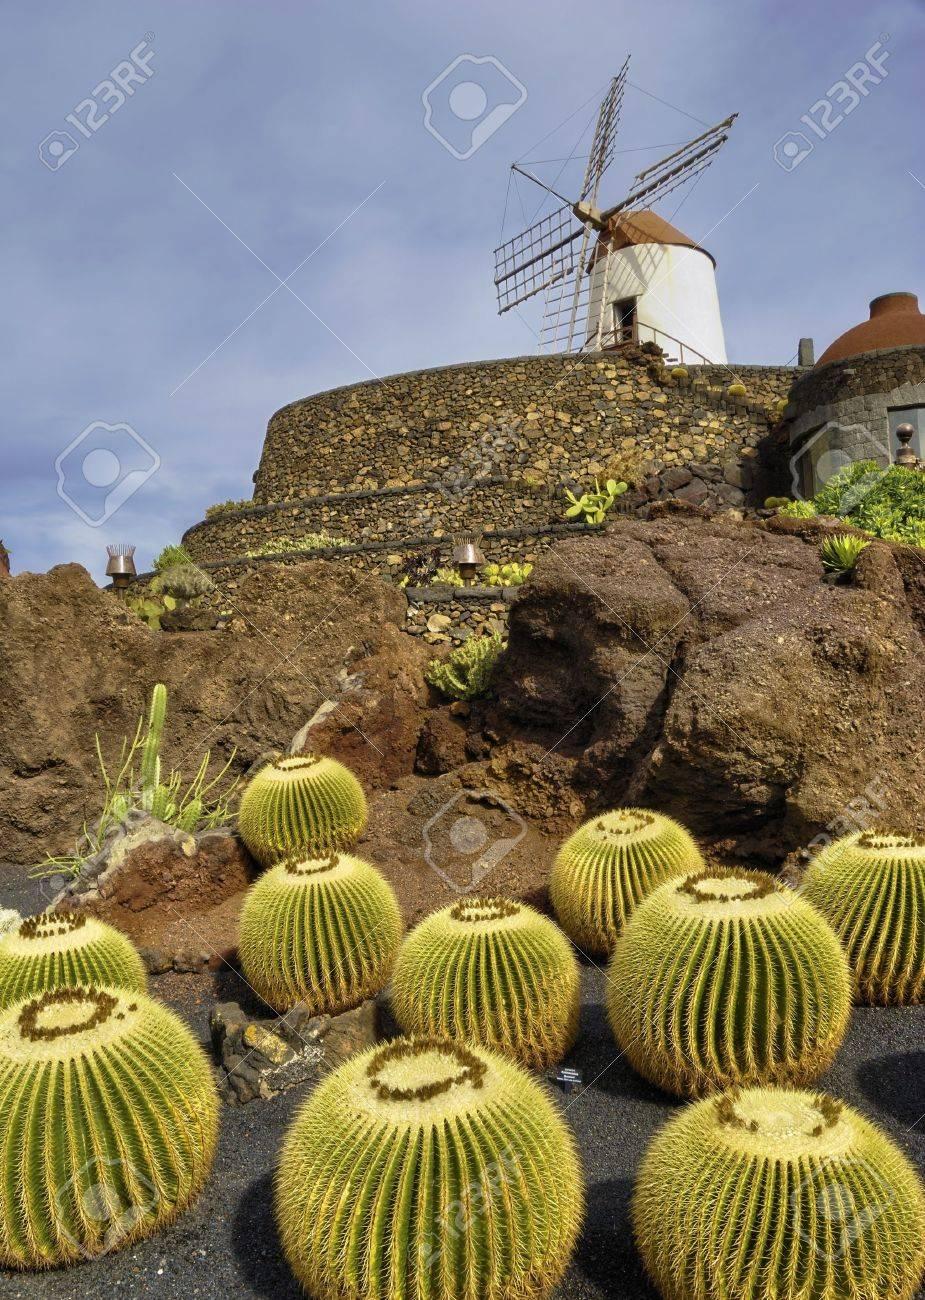 scenic view of cactus garden and windmill jardin de cactus guatiza lanzarote